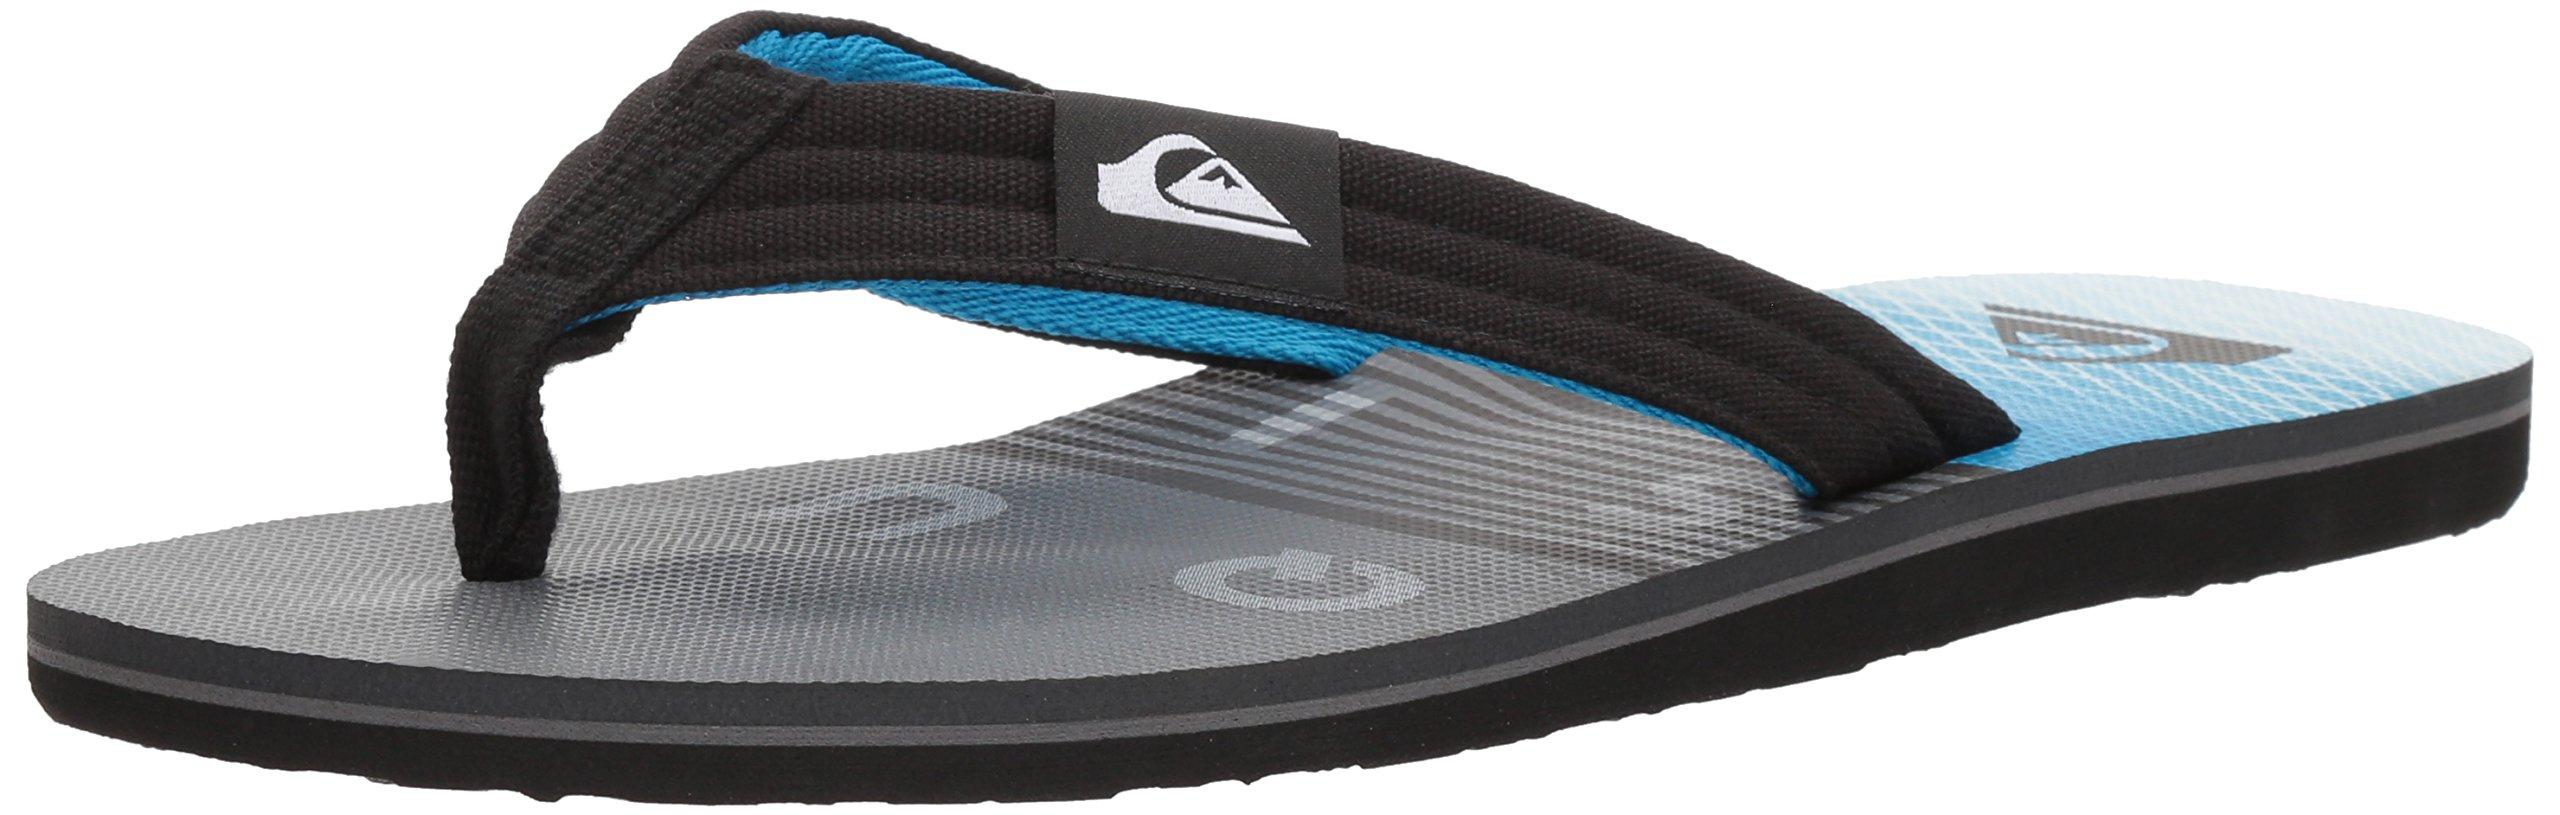 Quiksilver Men's Molokai Layback Sandal, Black/Grey/Blue, 14 M US